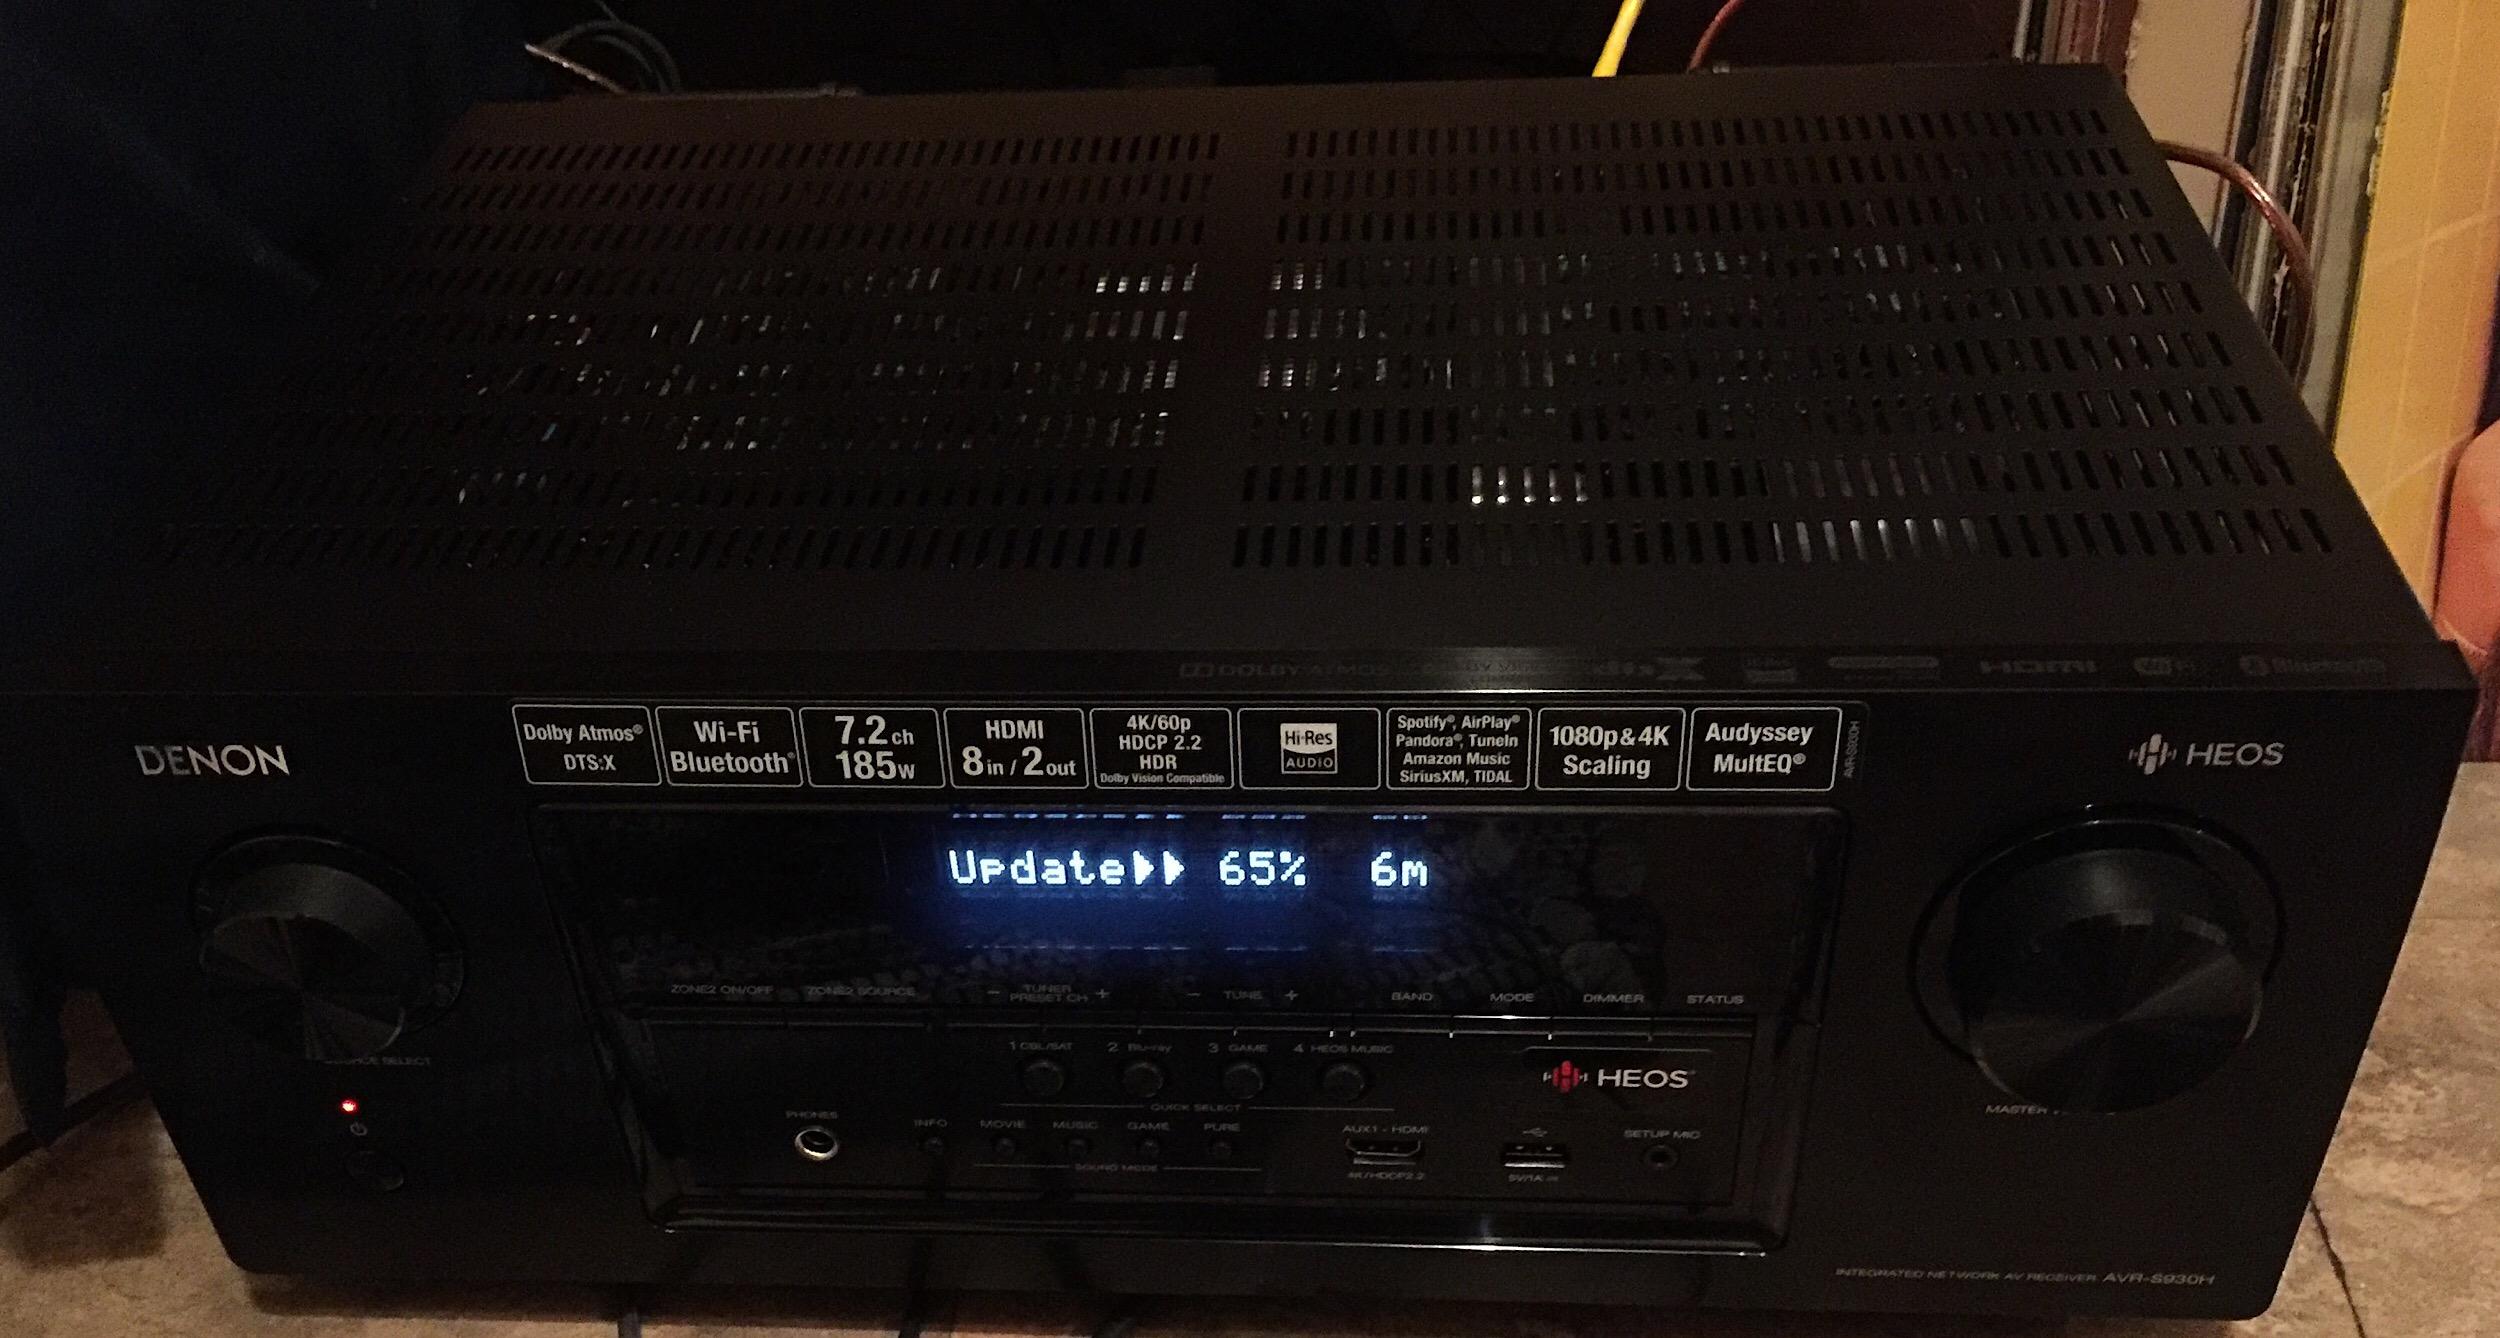 E966F65B-C097-4A60-9BB8-9C3759AAA2EE.jpeg